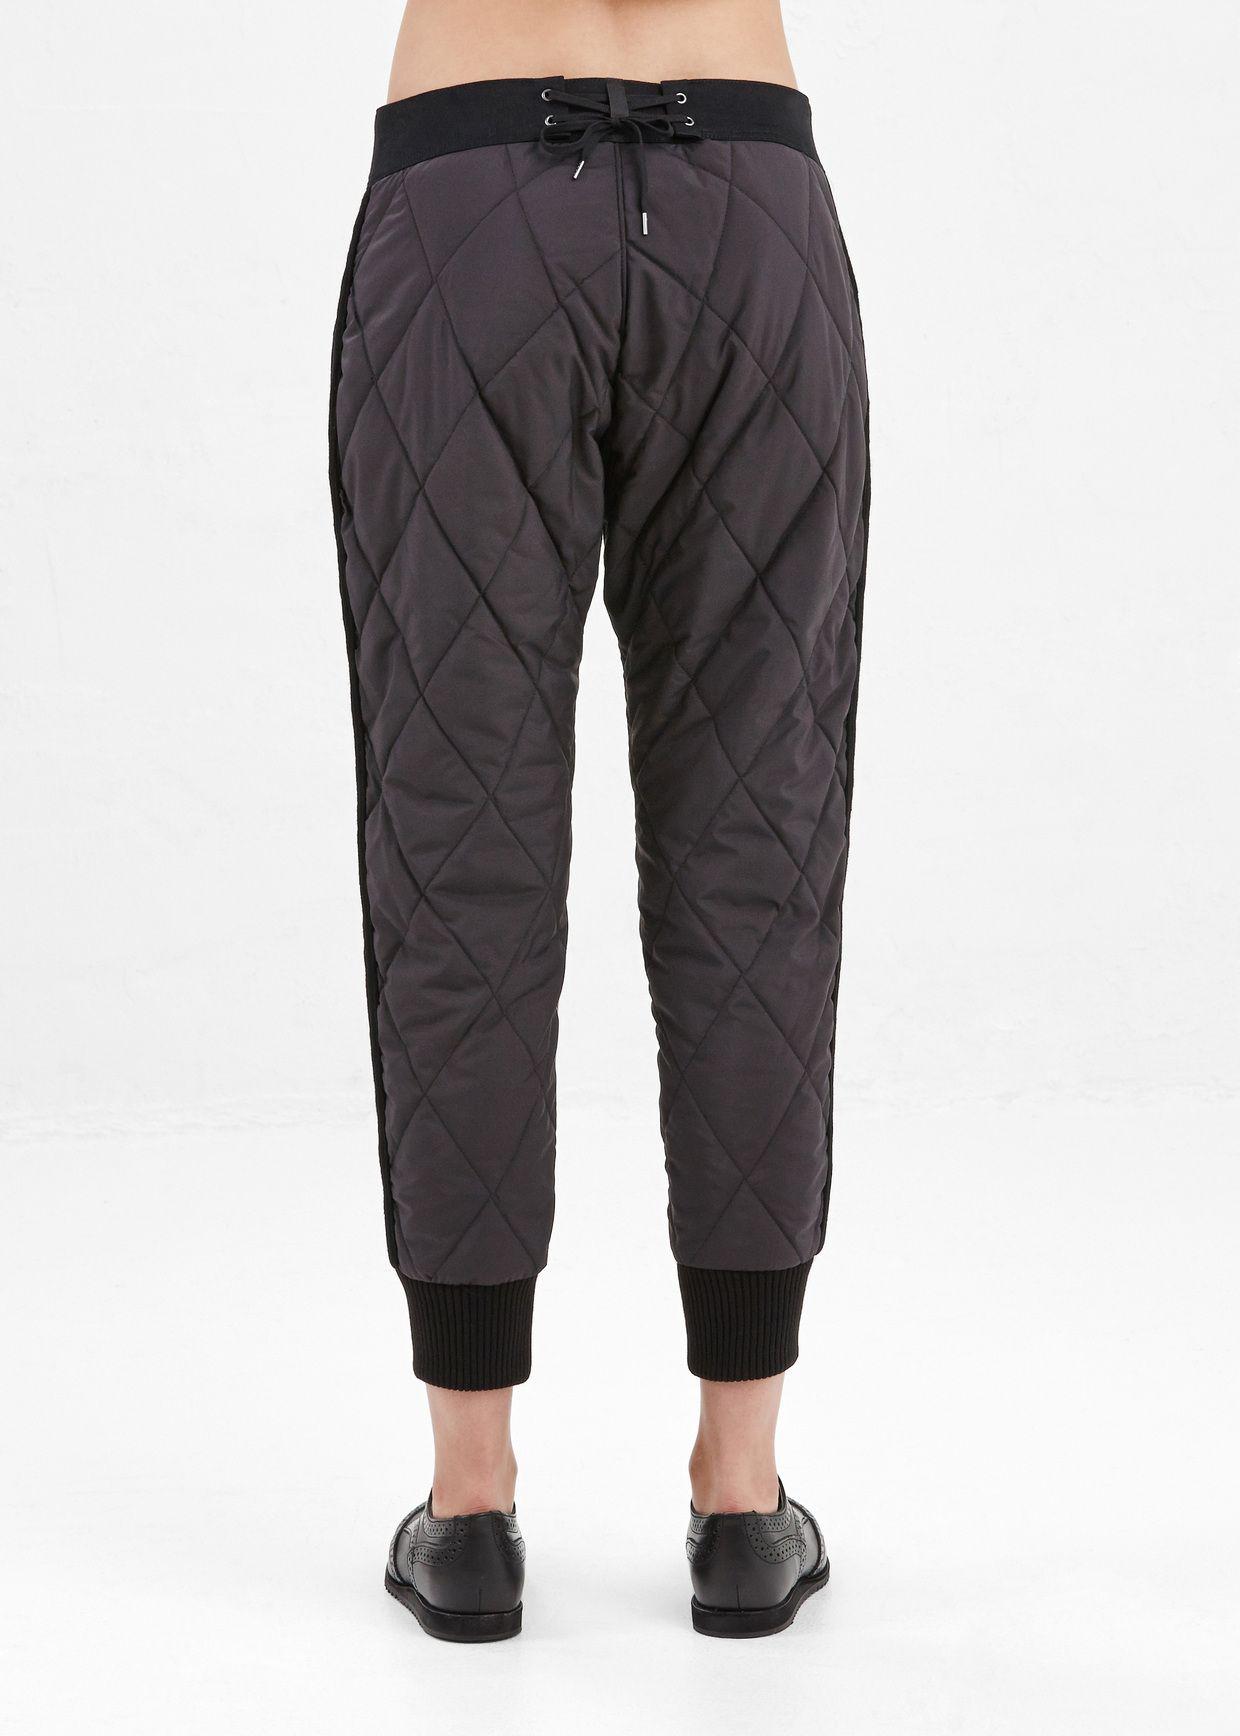 508f78b18e600 Totokaelo - Y s by Yohji Yamamoto Black Quilted Jogger Pants ...